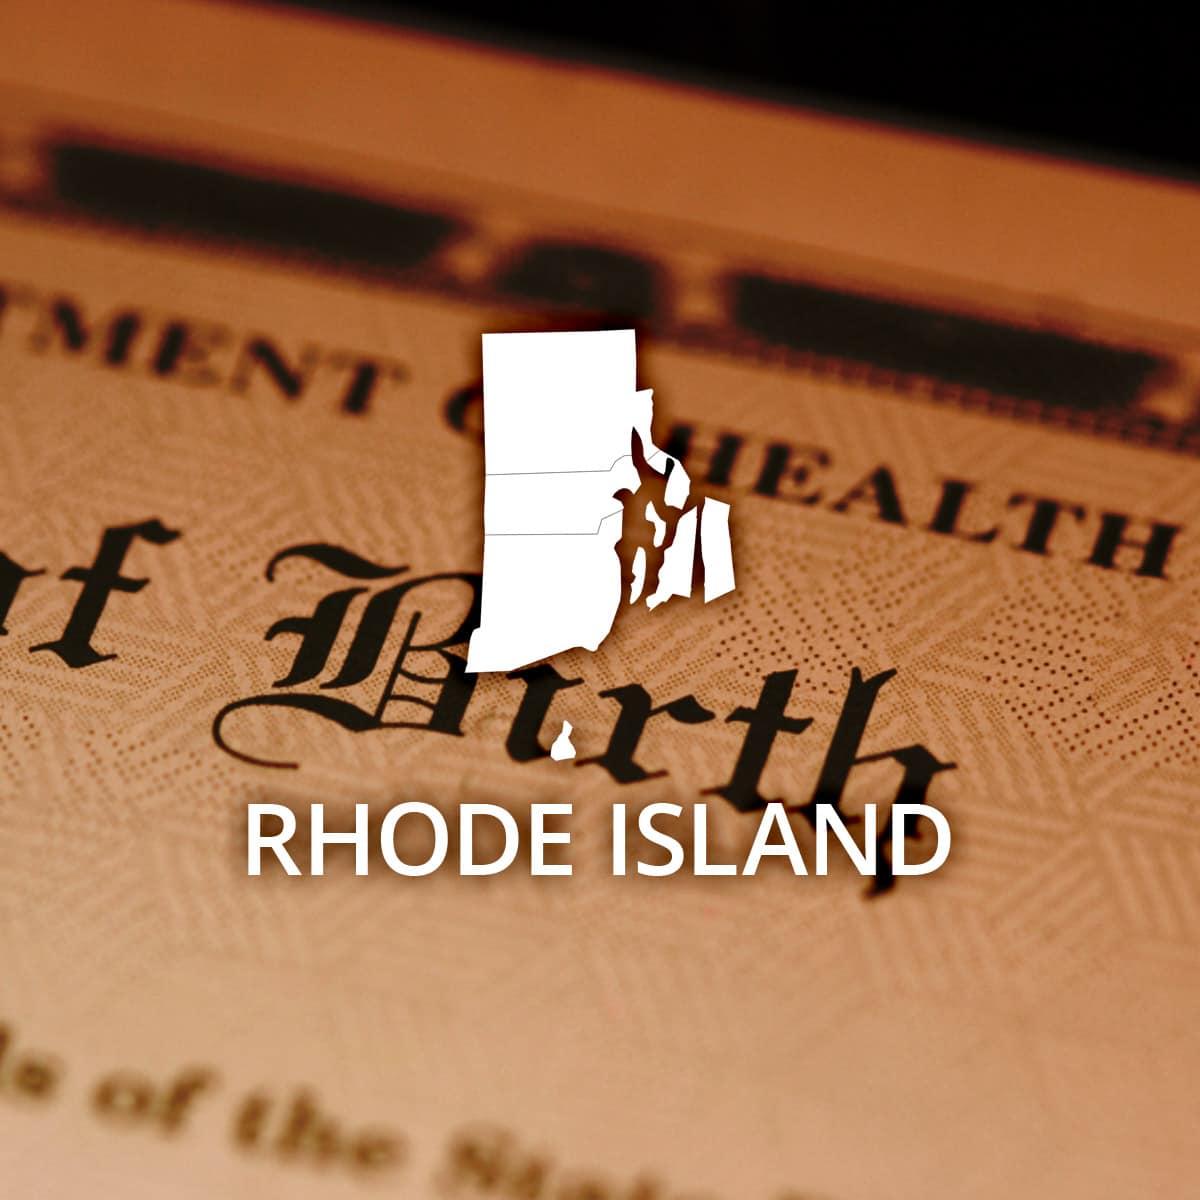 Where to Obtain a Rhode Island Birth Certificate